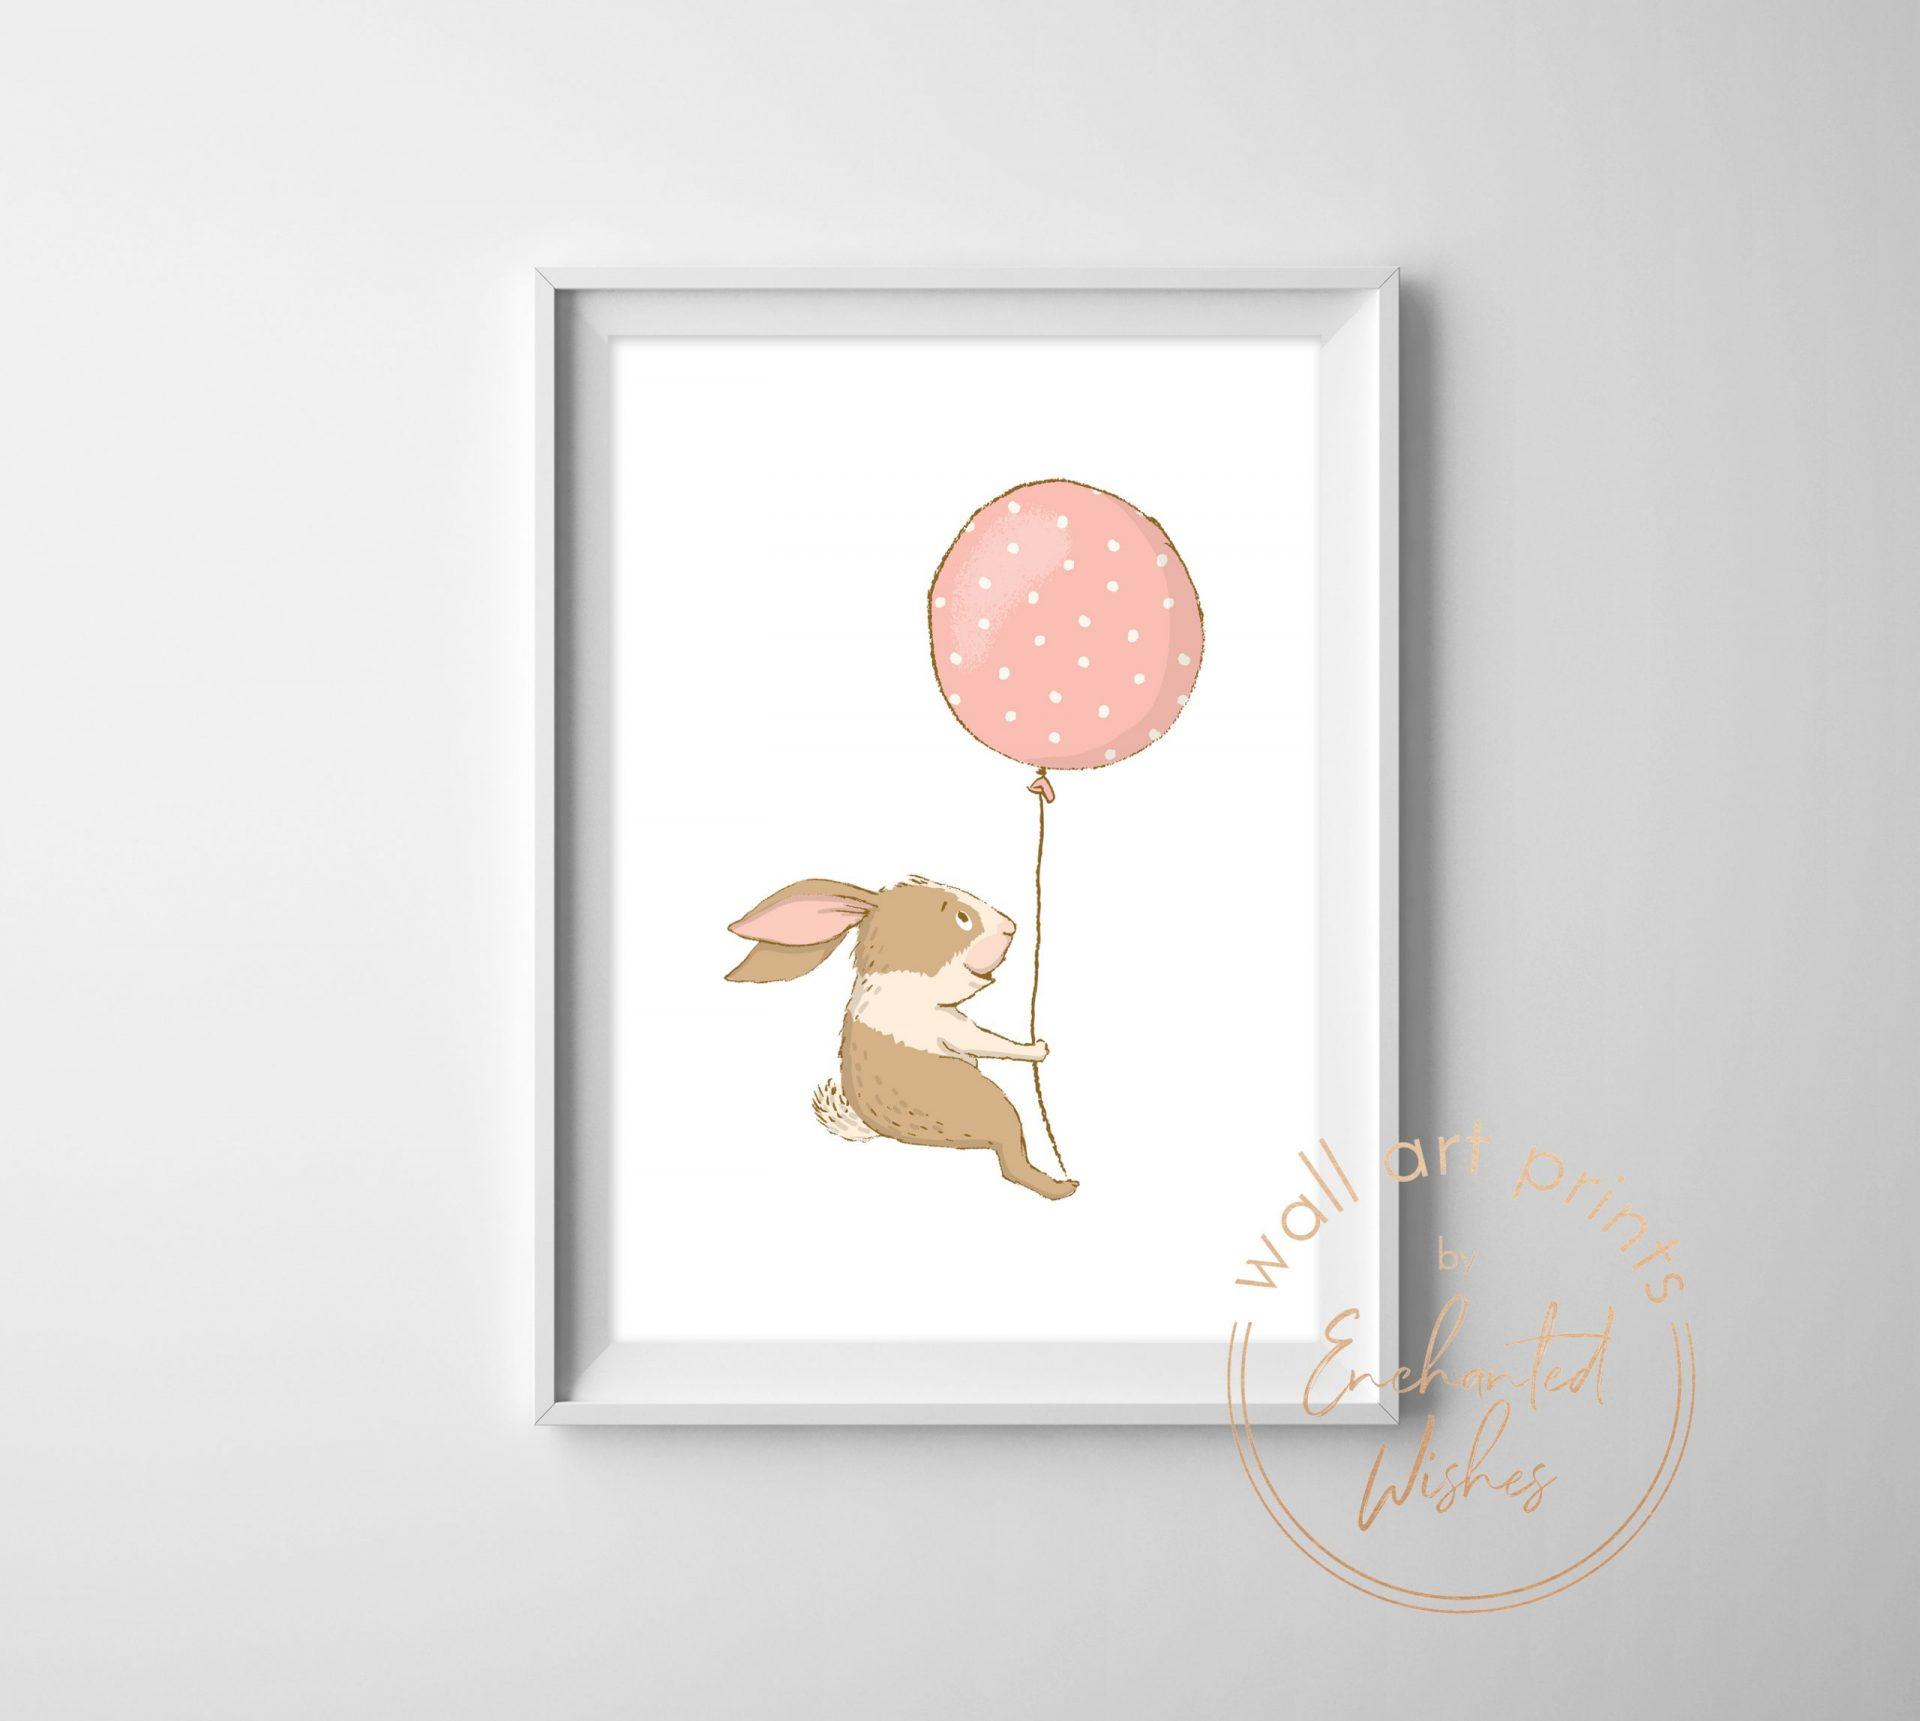 Bunny with balloon print